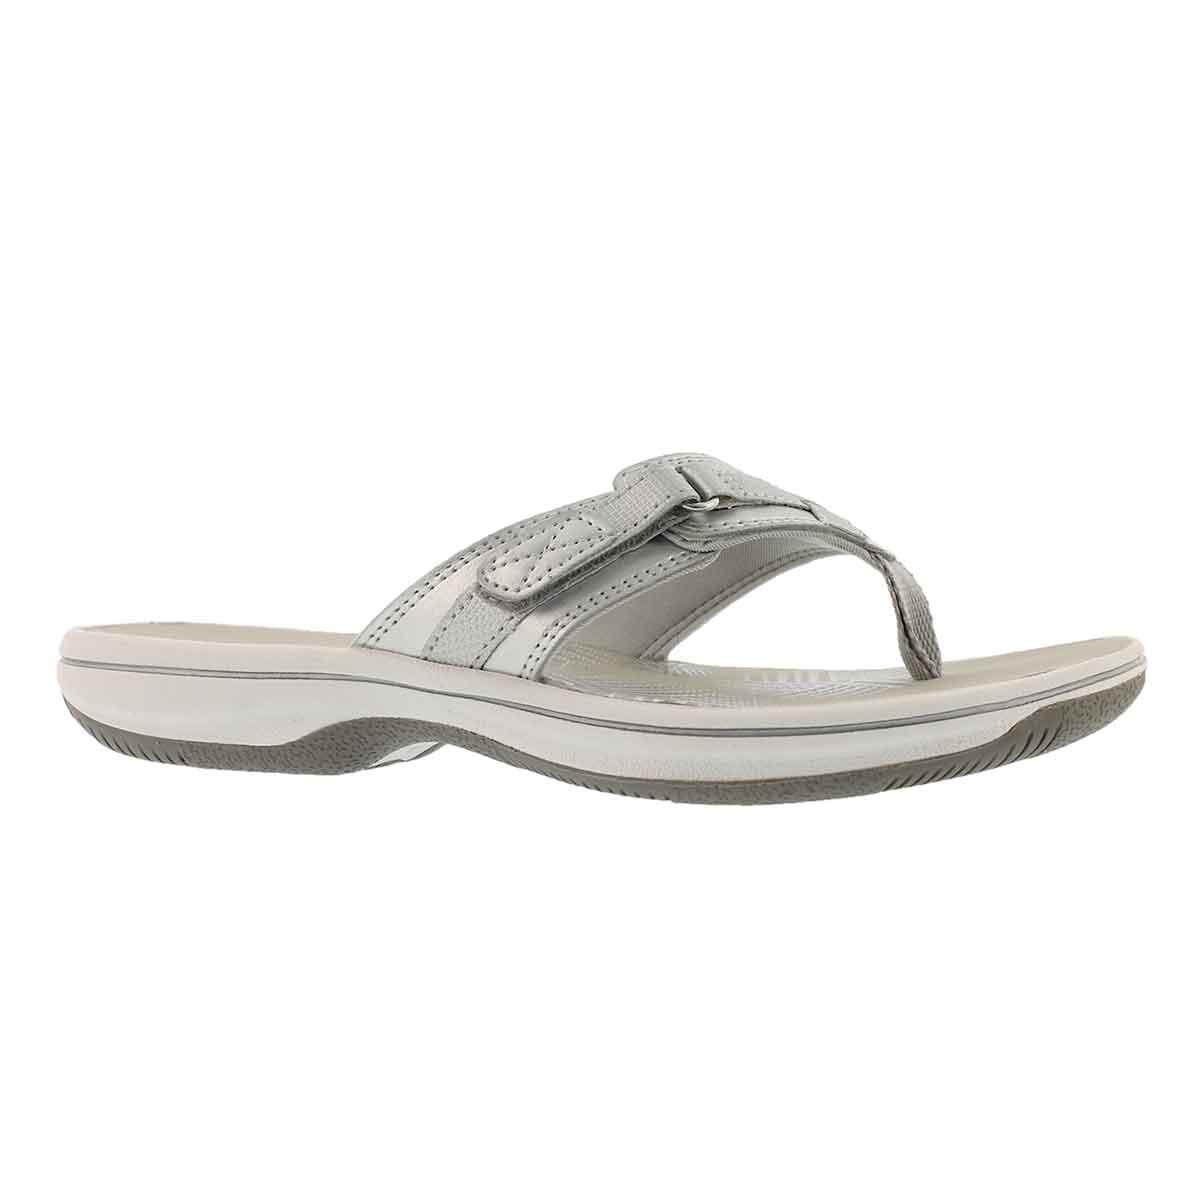 Women's BREEZE SEA silver thong sandals